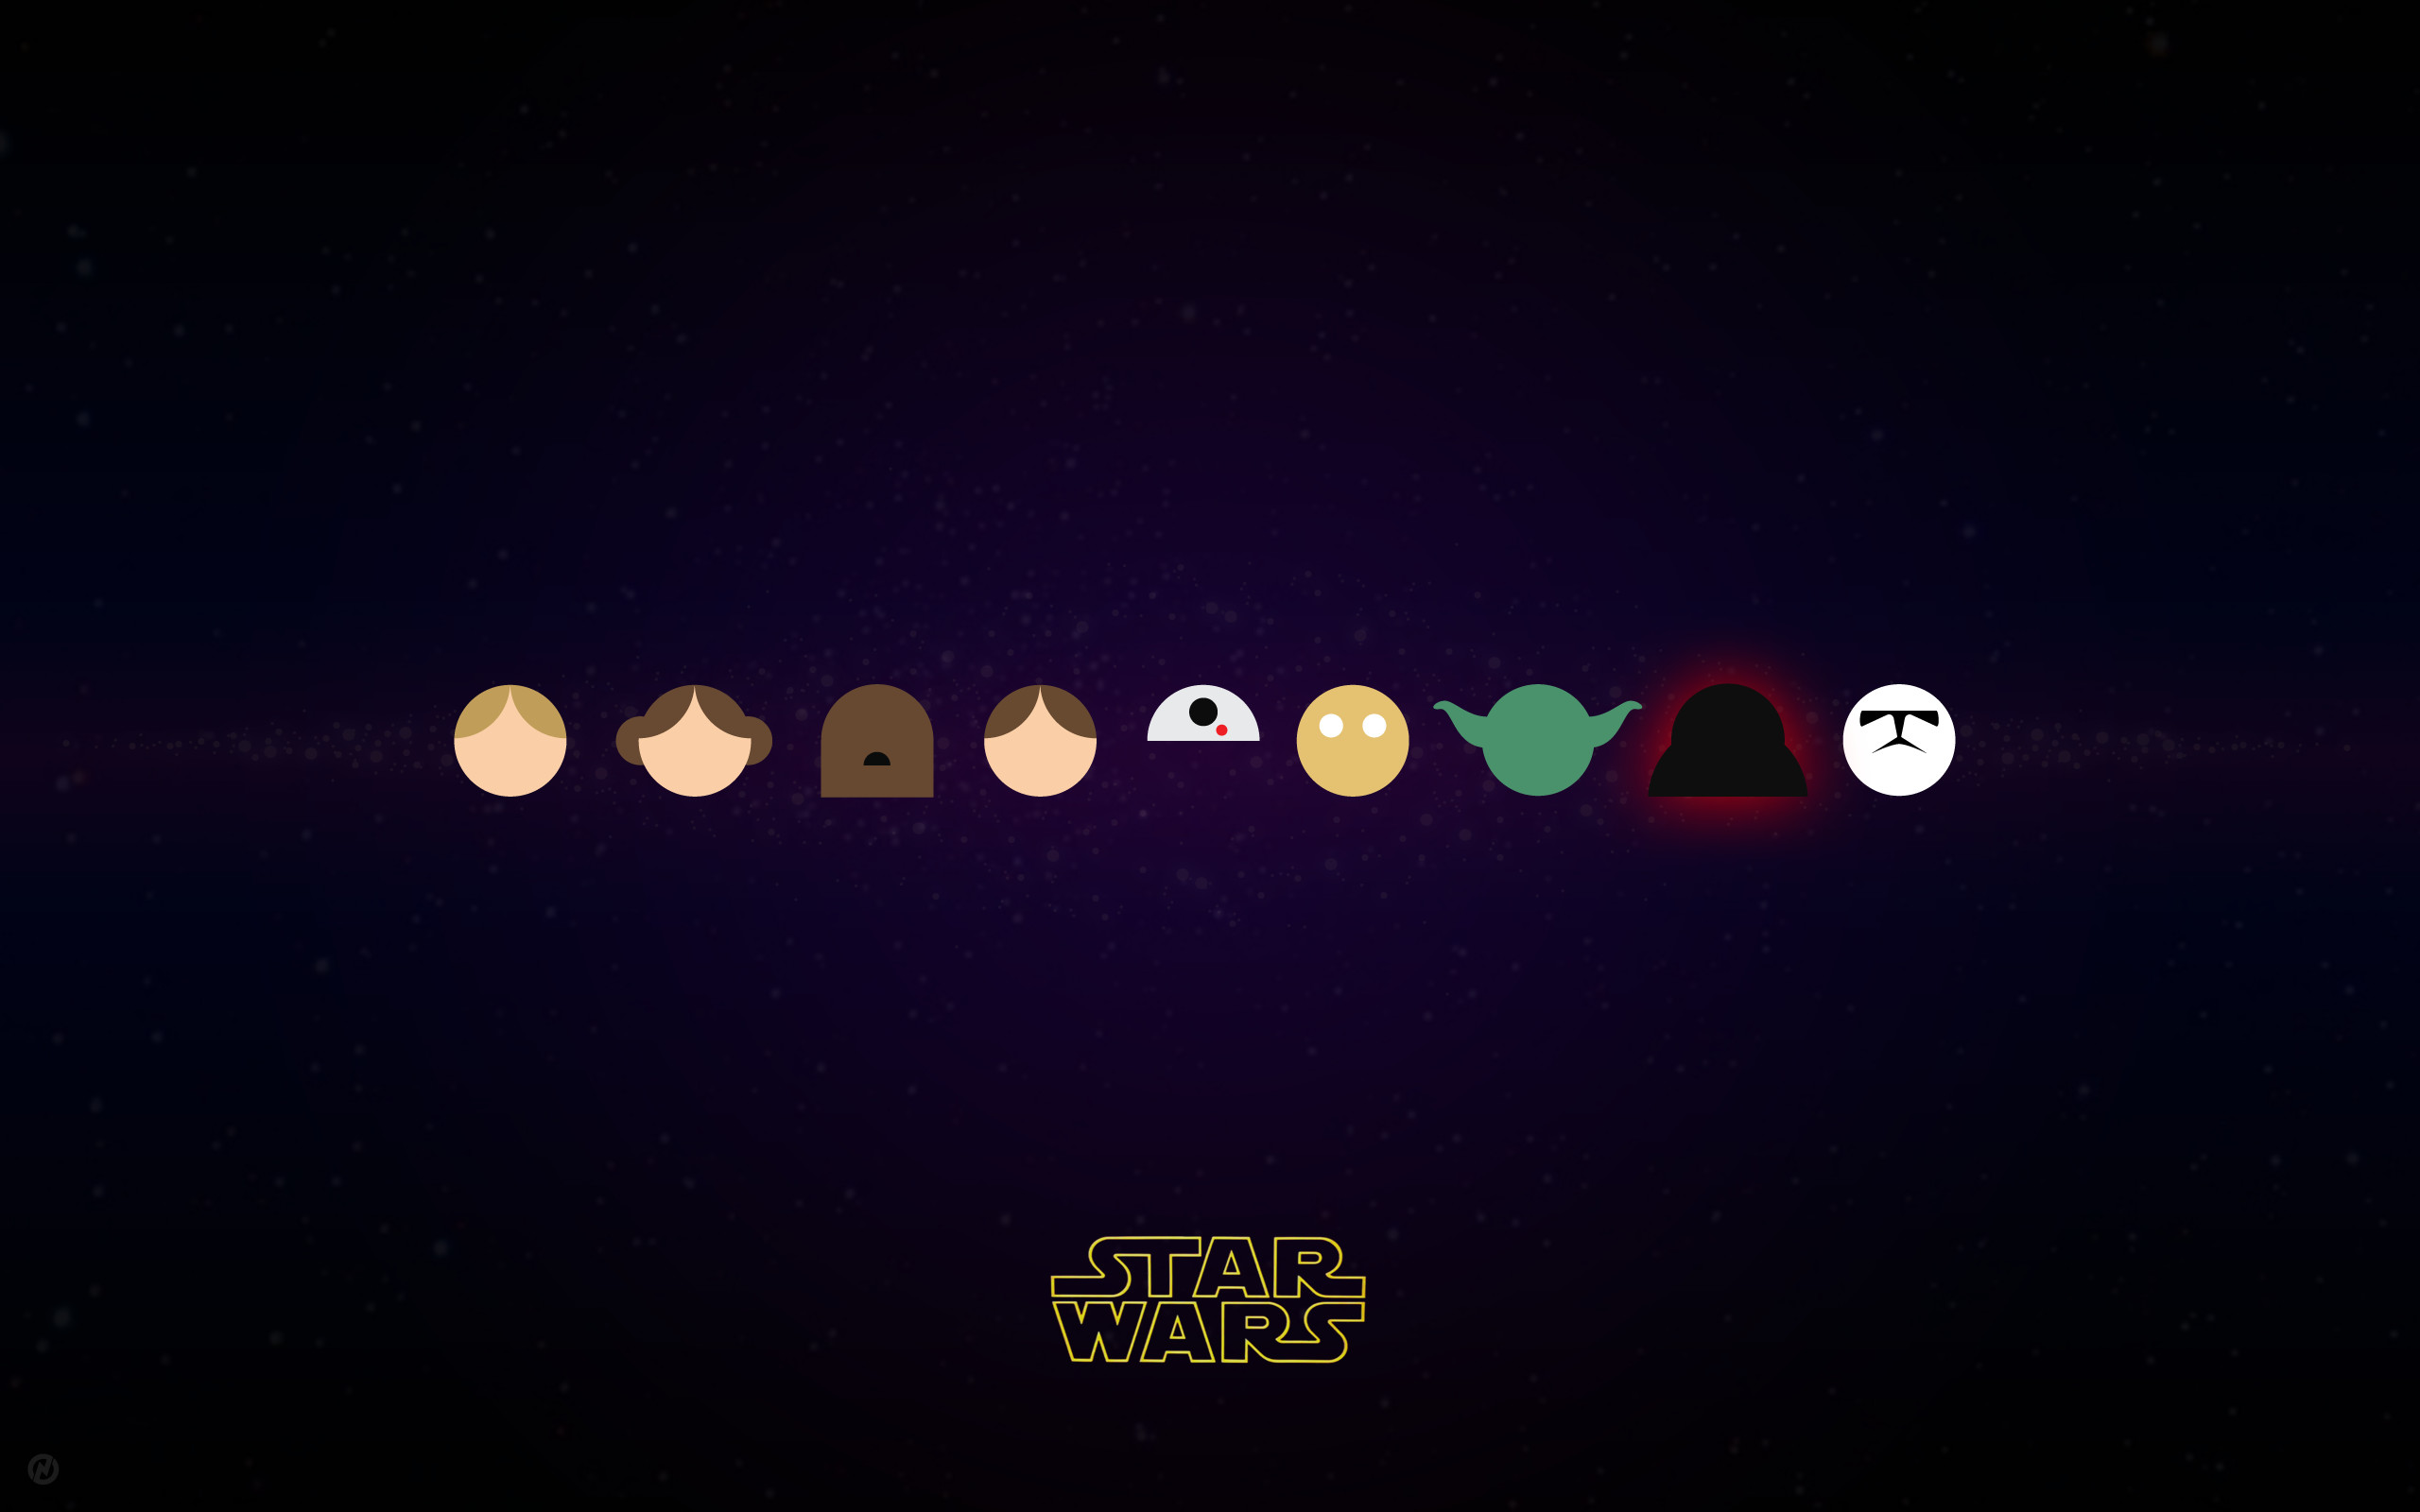 Star Wars Logo Wallpaper 67+ images